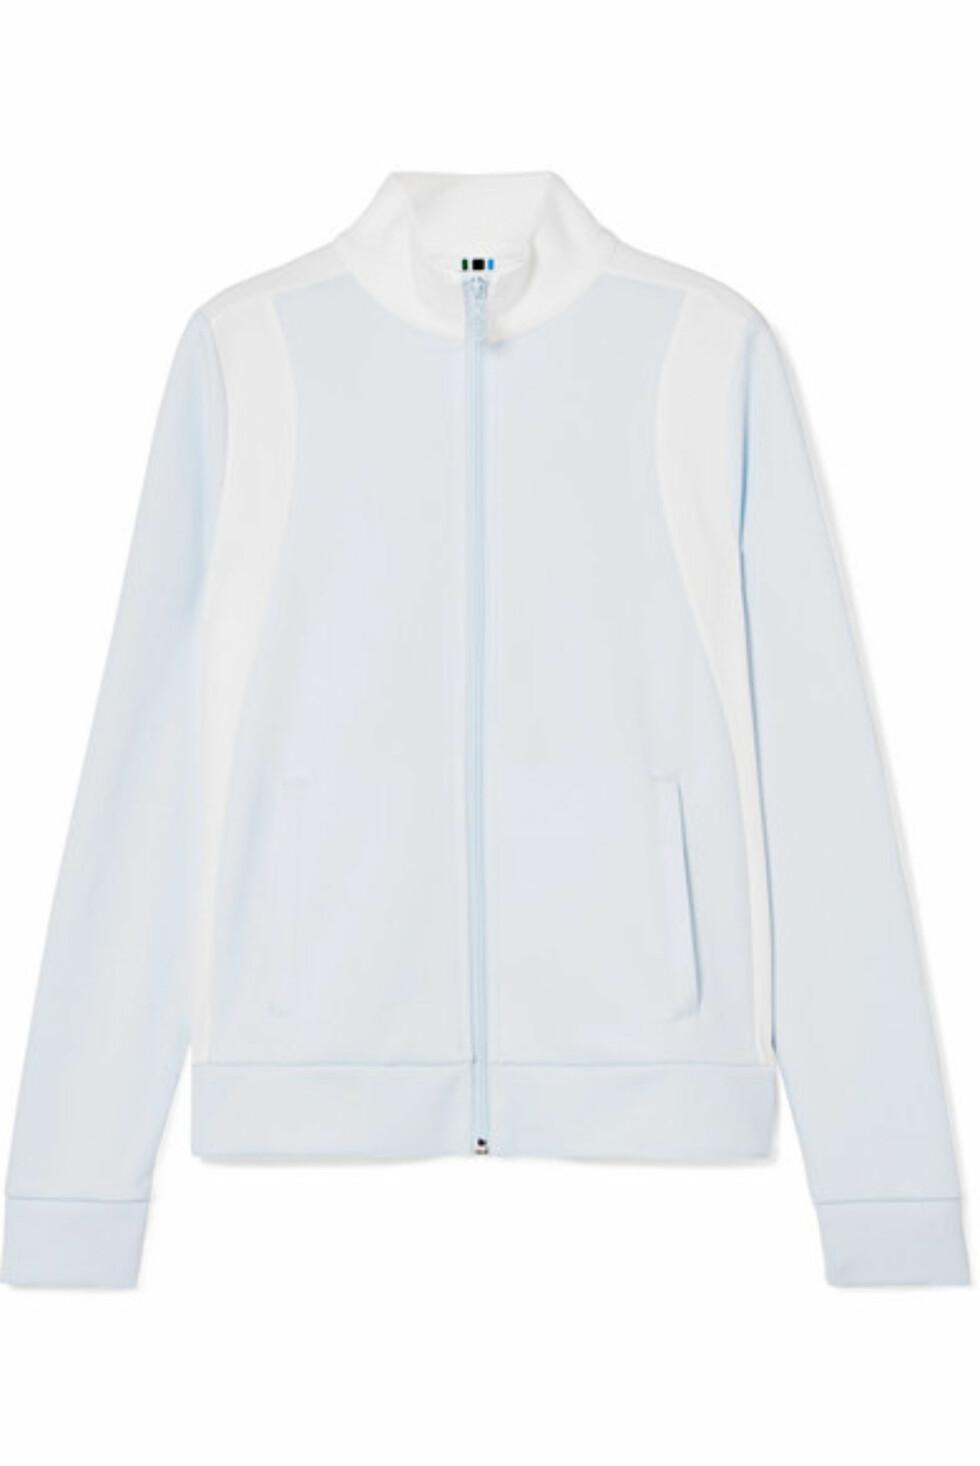 Jakke fra Tory Sport via Net-a-porter.com |1990,-| https://www.net-a-porter.com/no/en/product/1021288/tory_sport/two-tone-pique-track-jacket